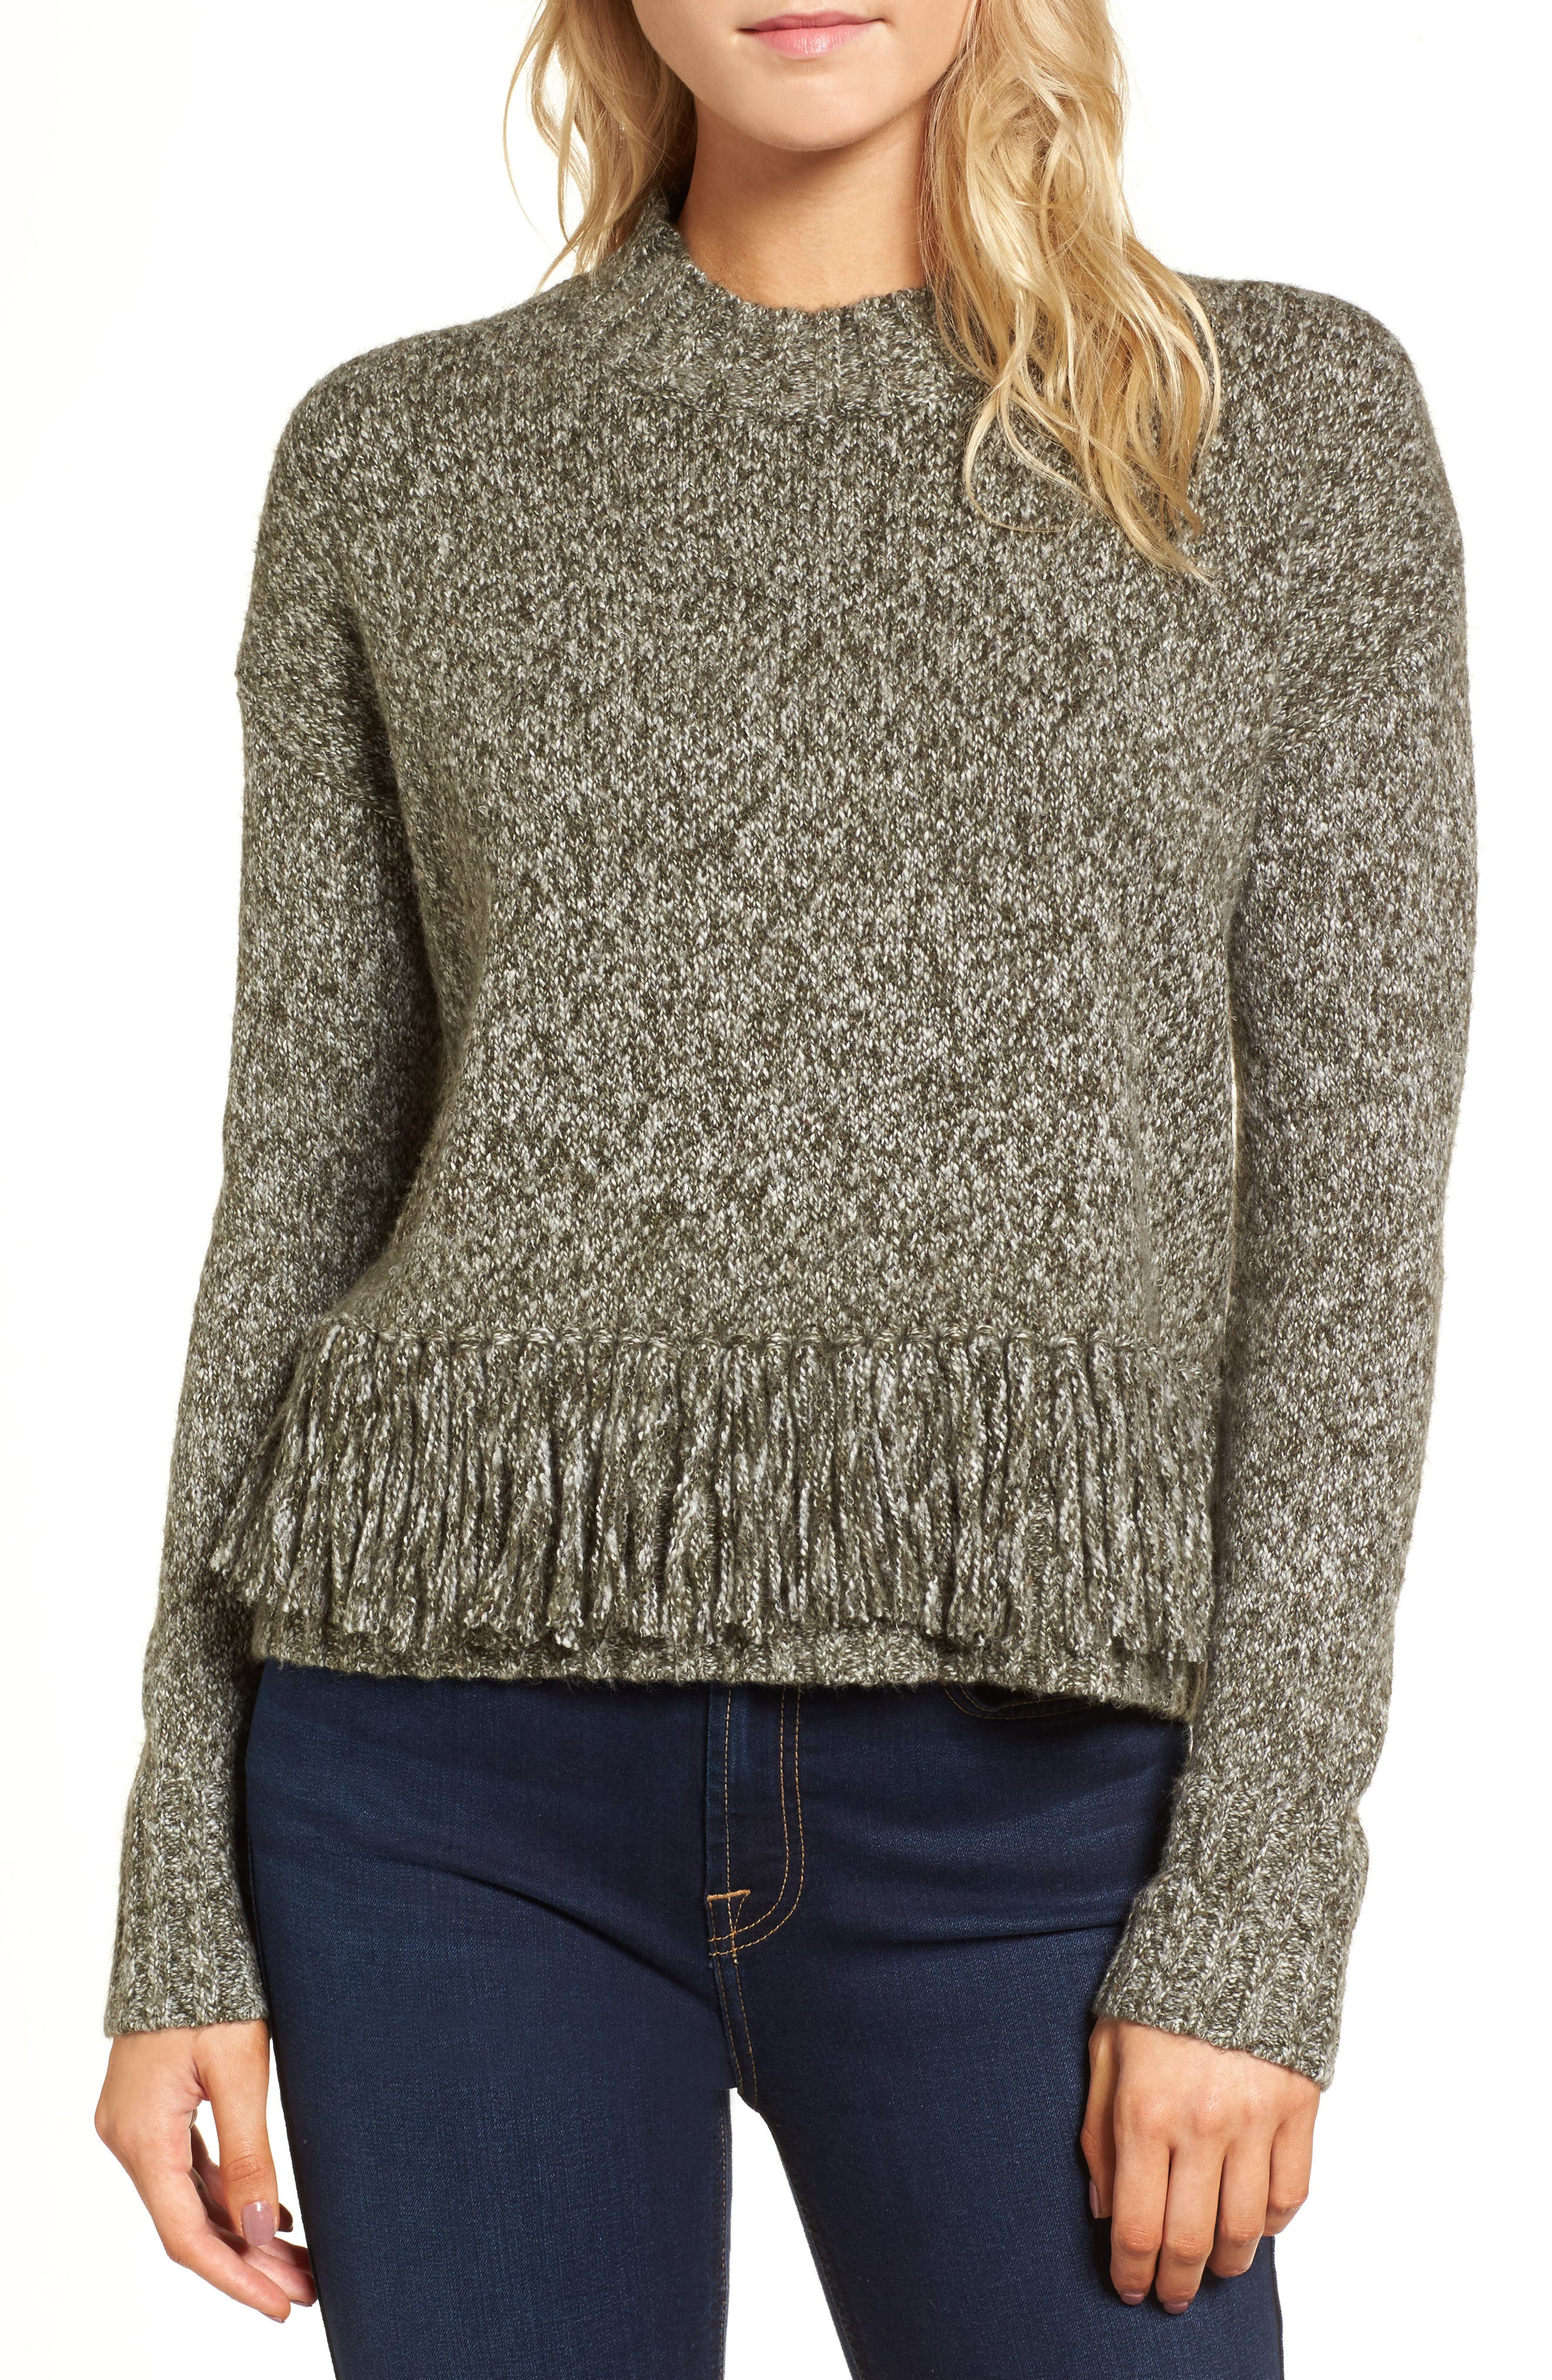 Rebecca Minkoff Neala Sweater